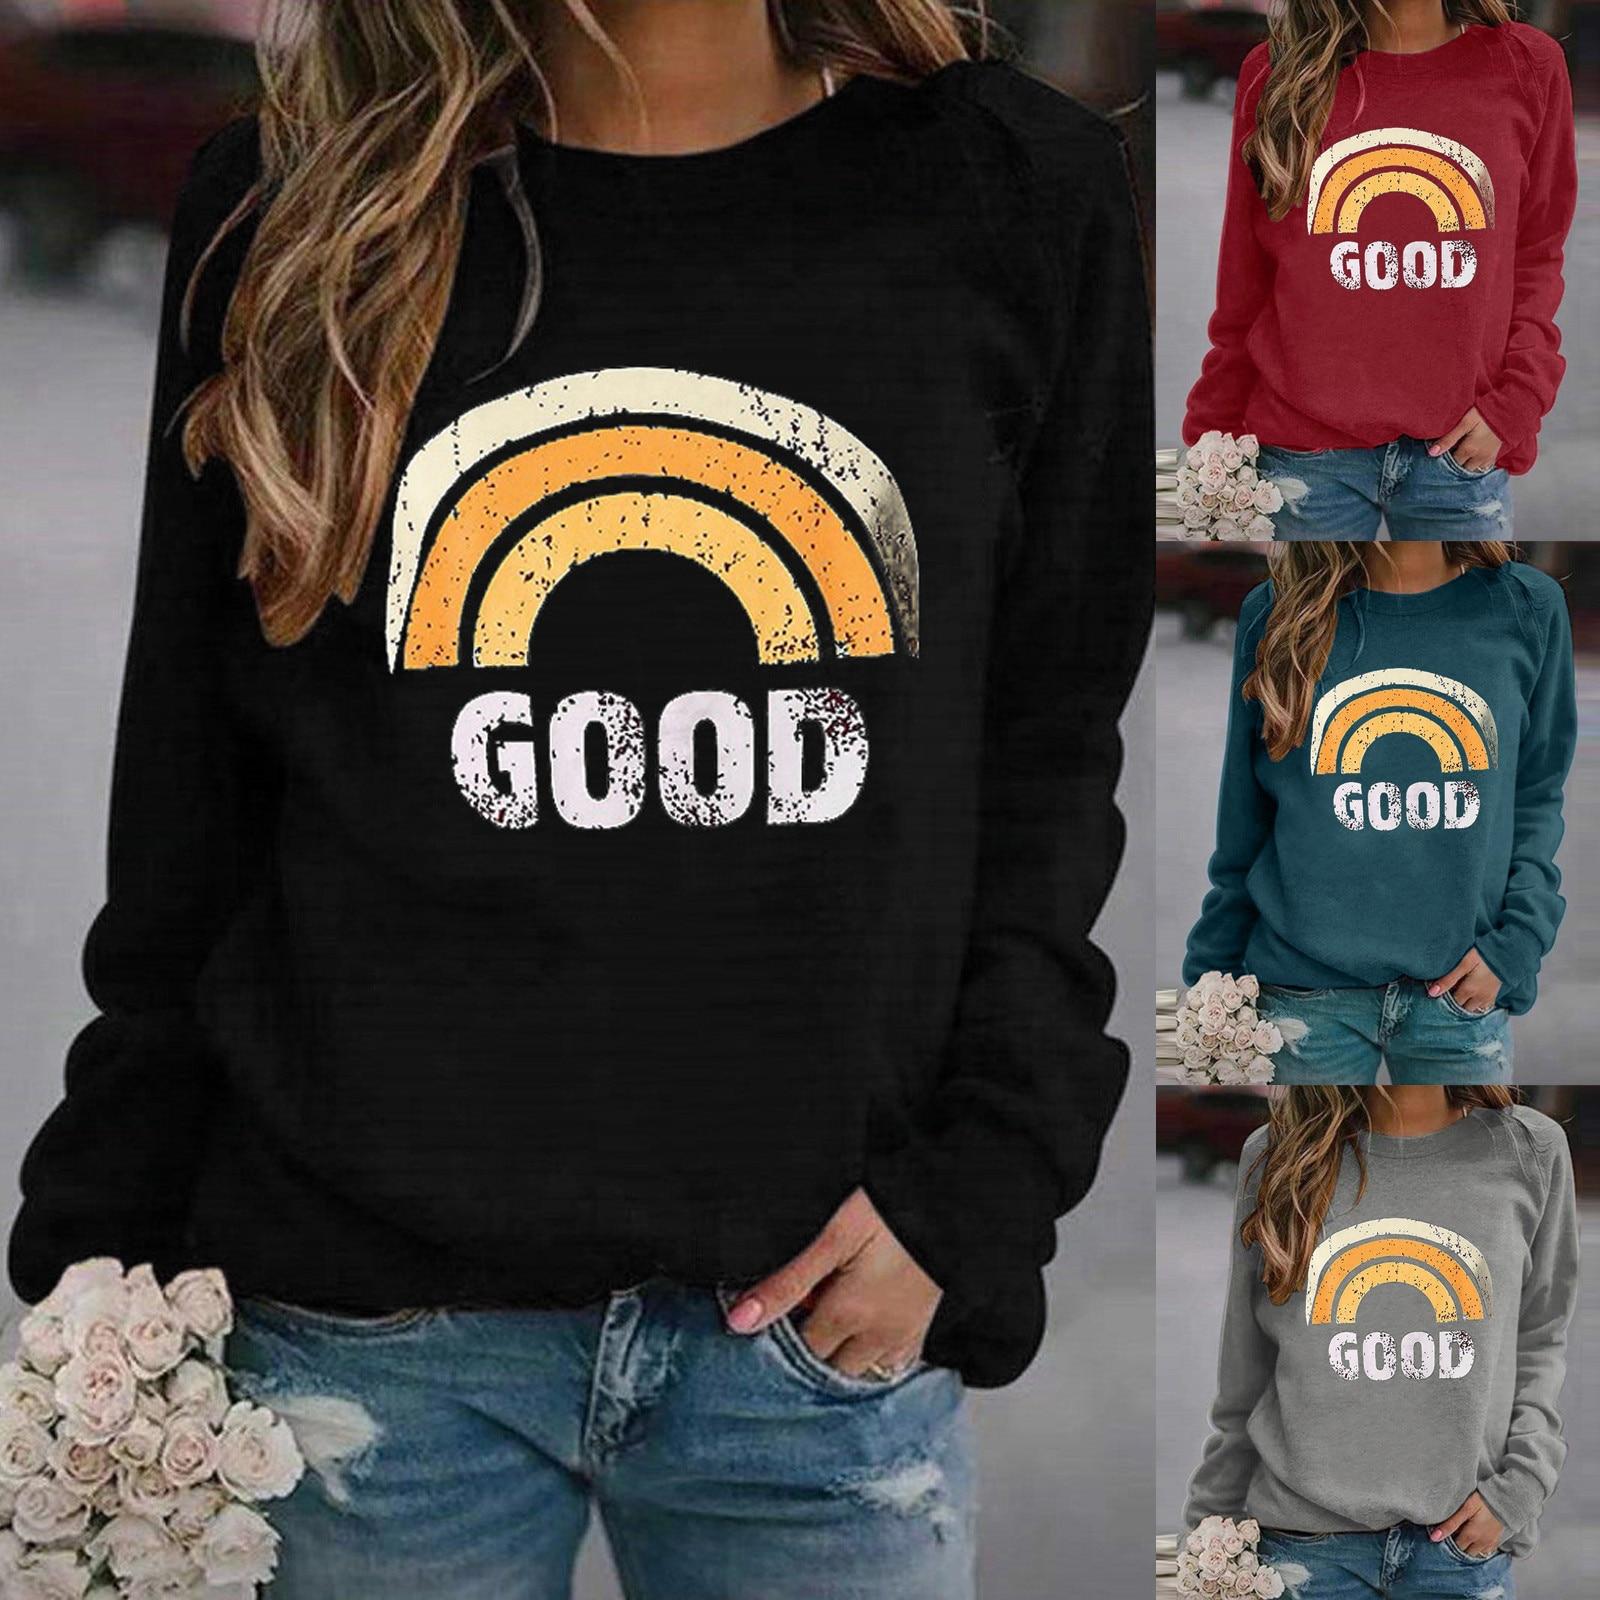 Plus Size Fashion Rainbow Print Blouse O-Neck Tops Tee Casual Autumn Winter Tops Ladies Female Women Long Sleeve Blusas Pullover